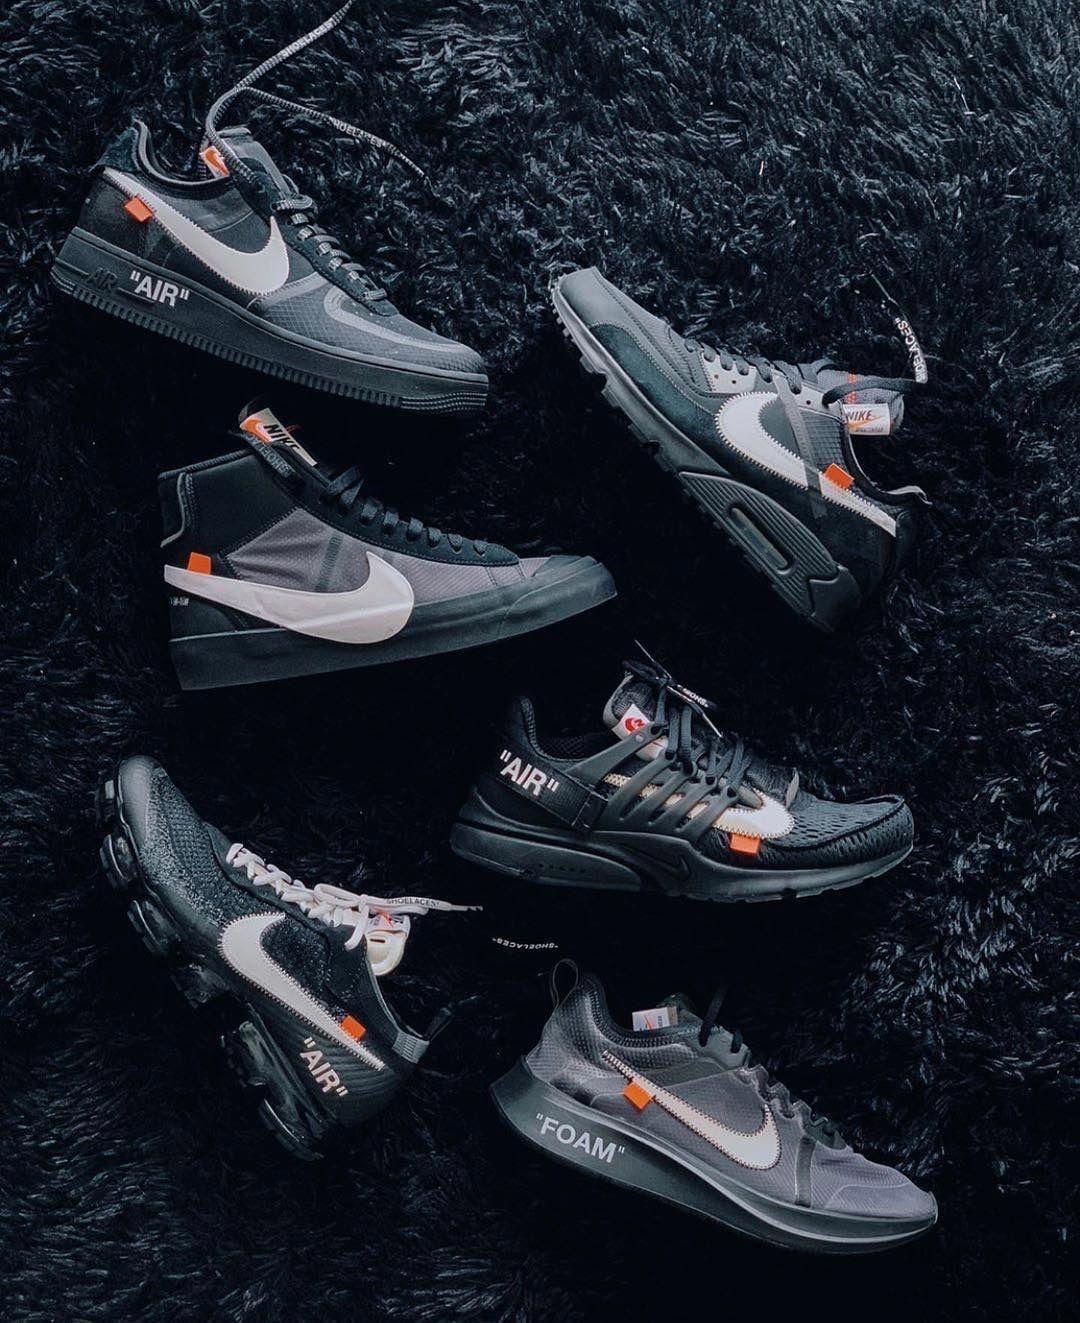 Off White Nike Air Force 1 Black AO4606 001 Info